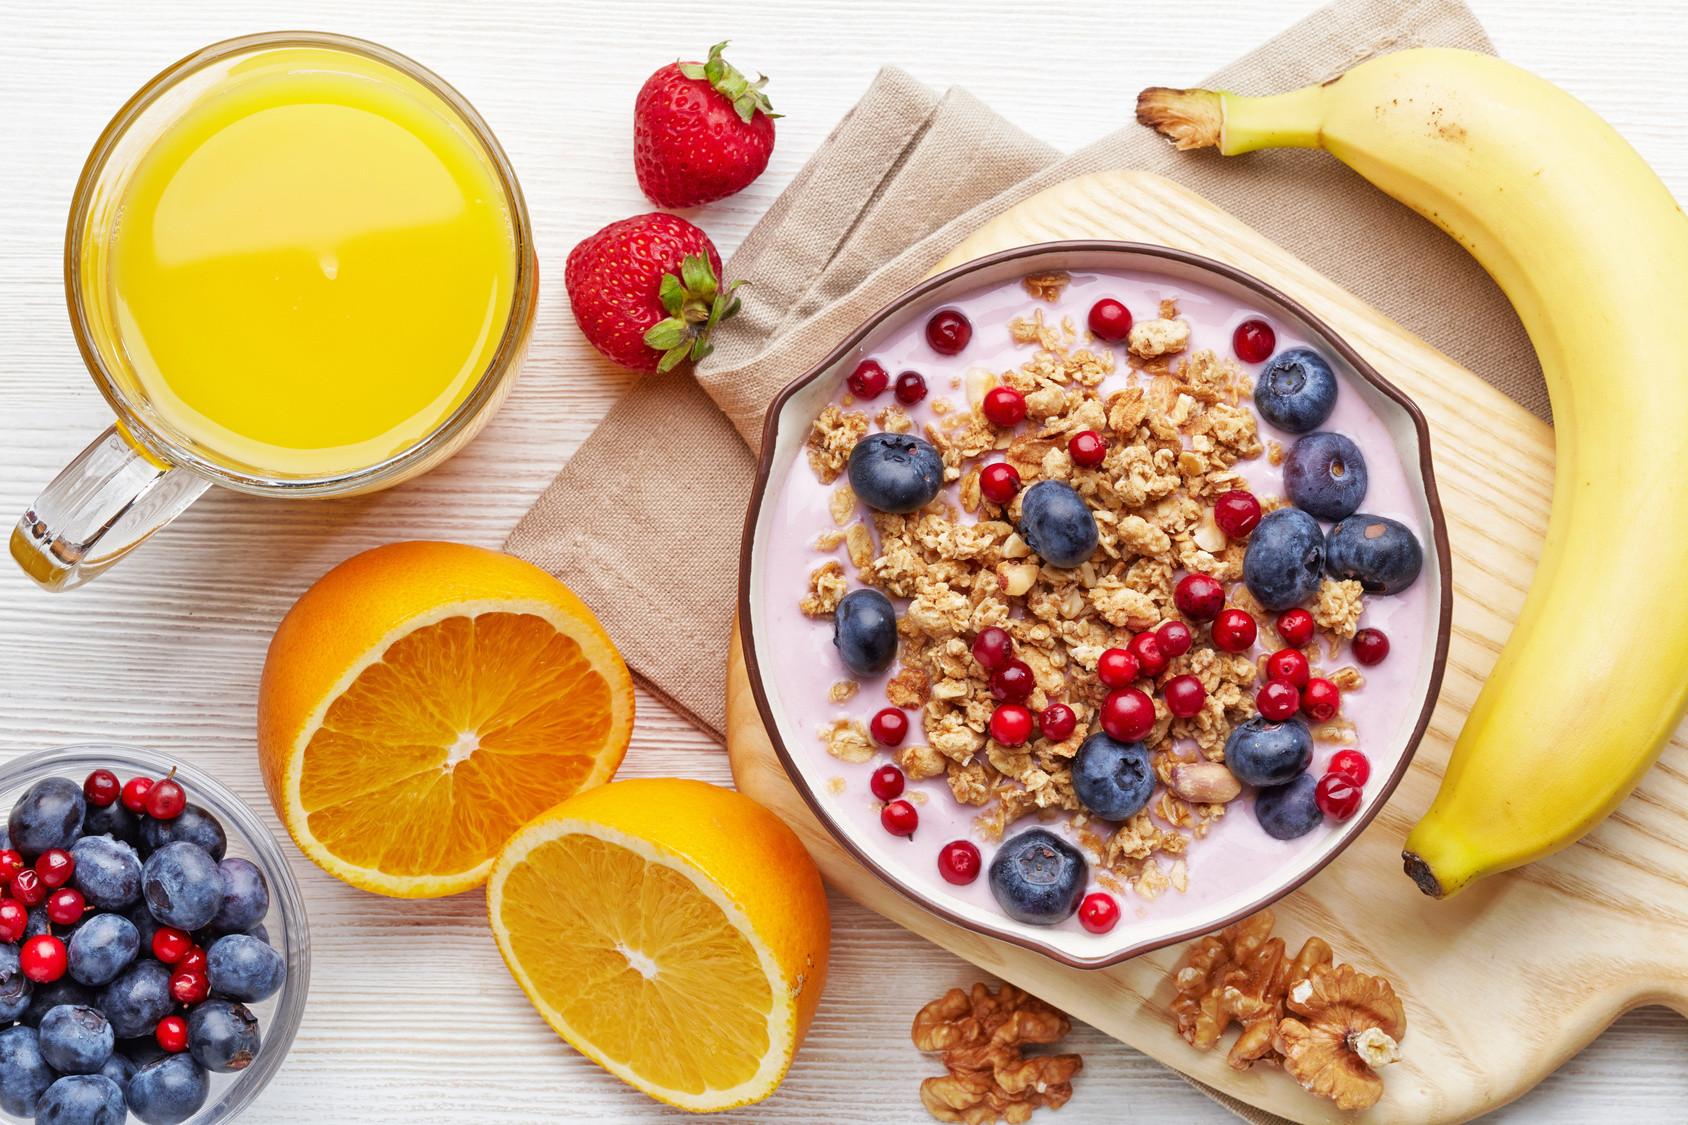 A Healthy Breakfast  Easy And Healthy Breakfast Ideas